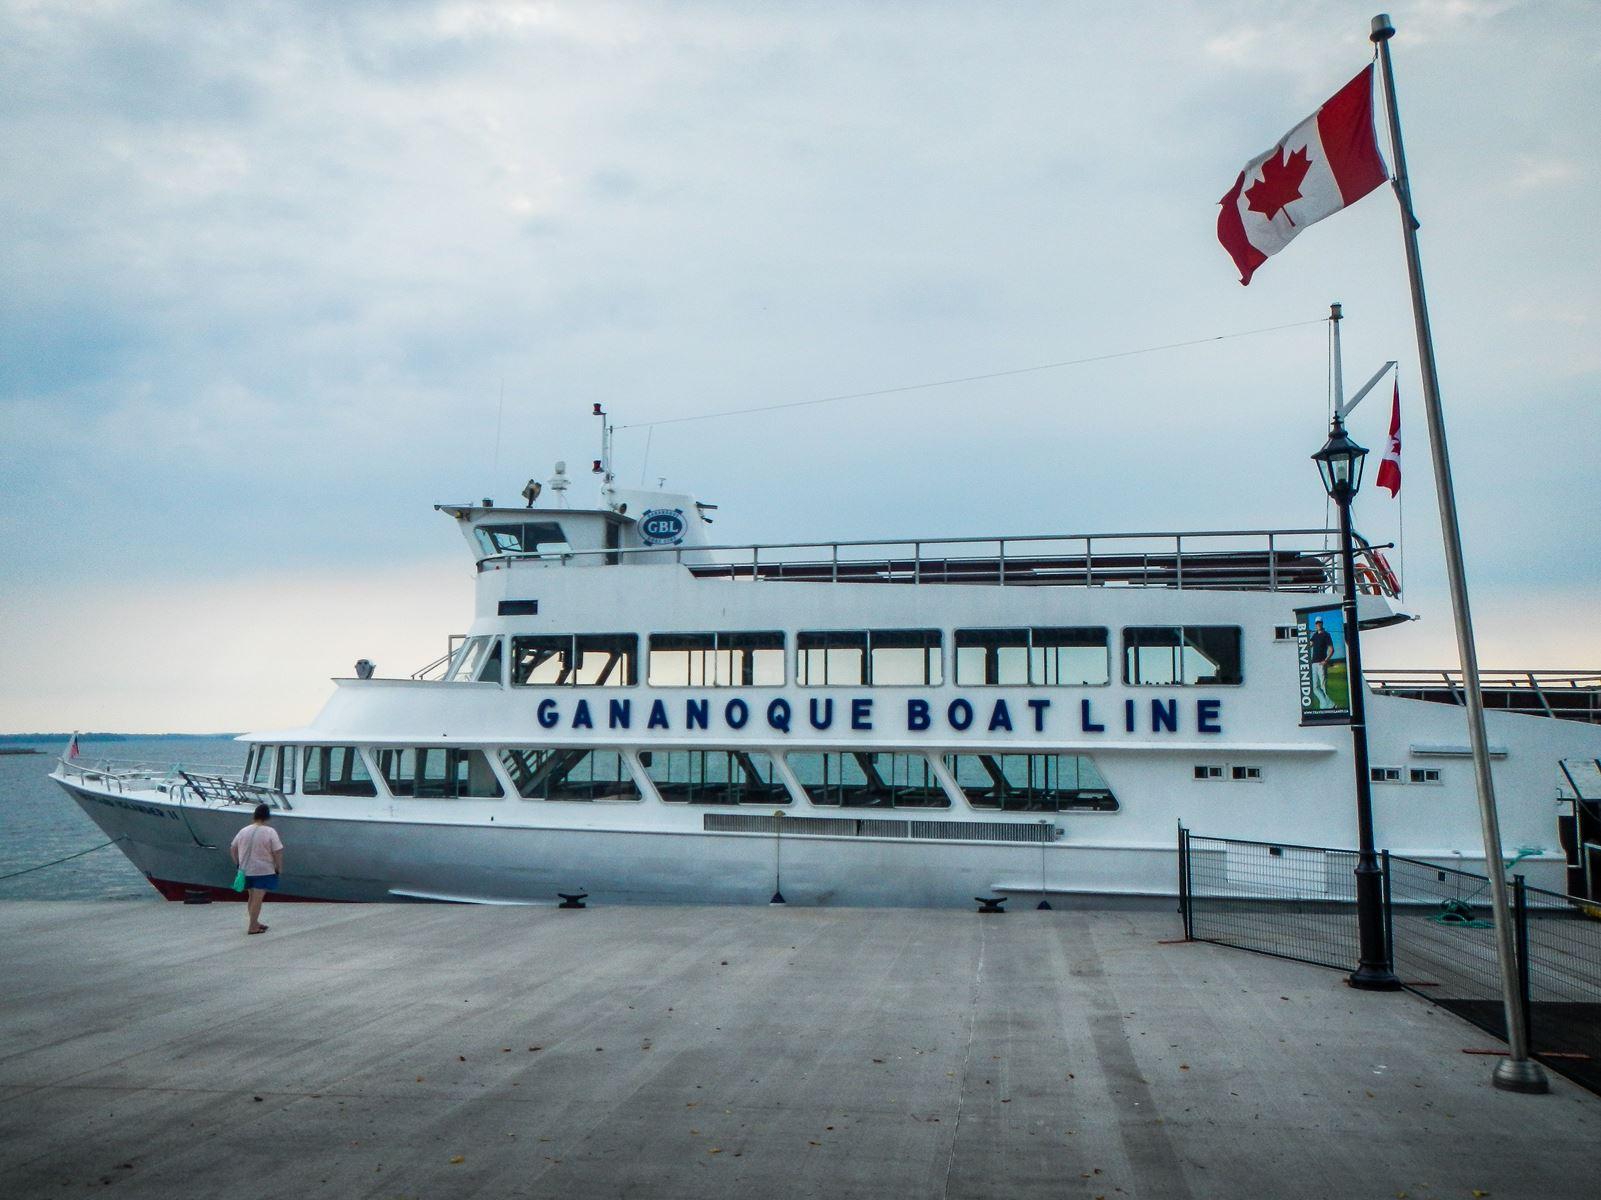 Croisière depuis Gananoque - Canada